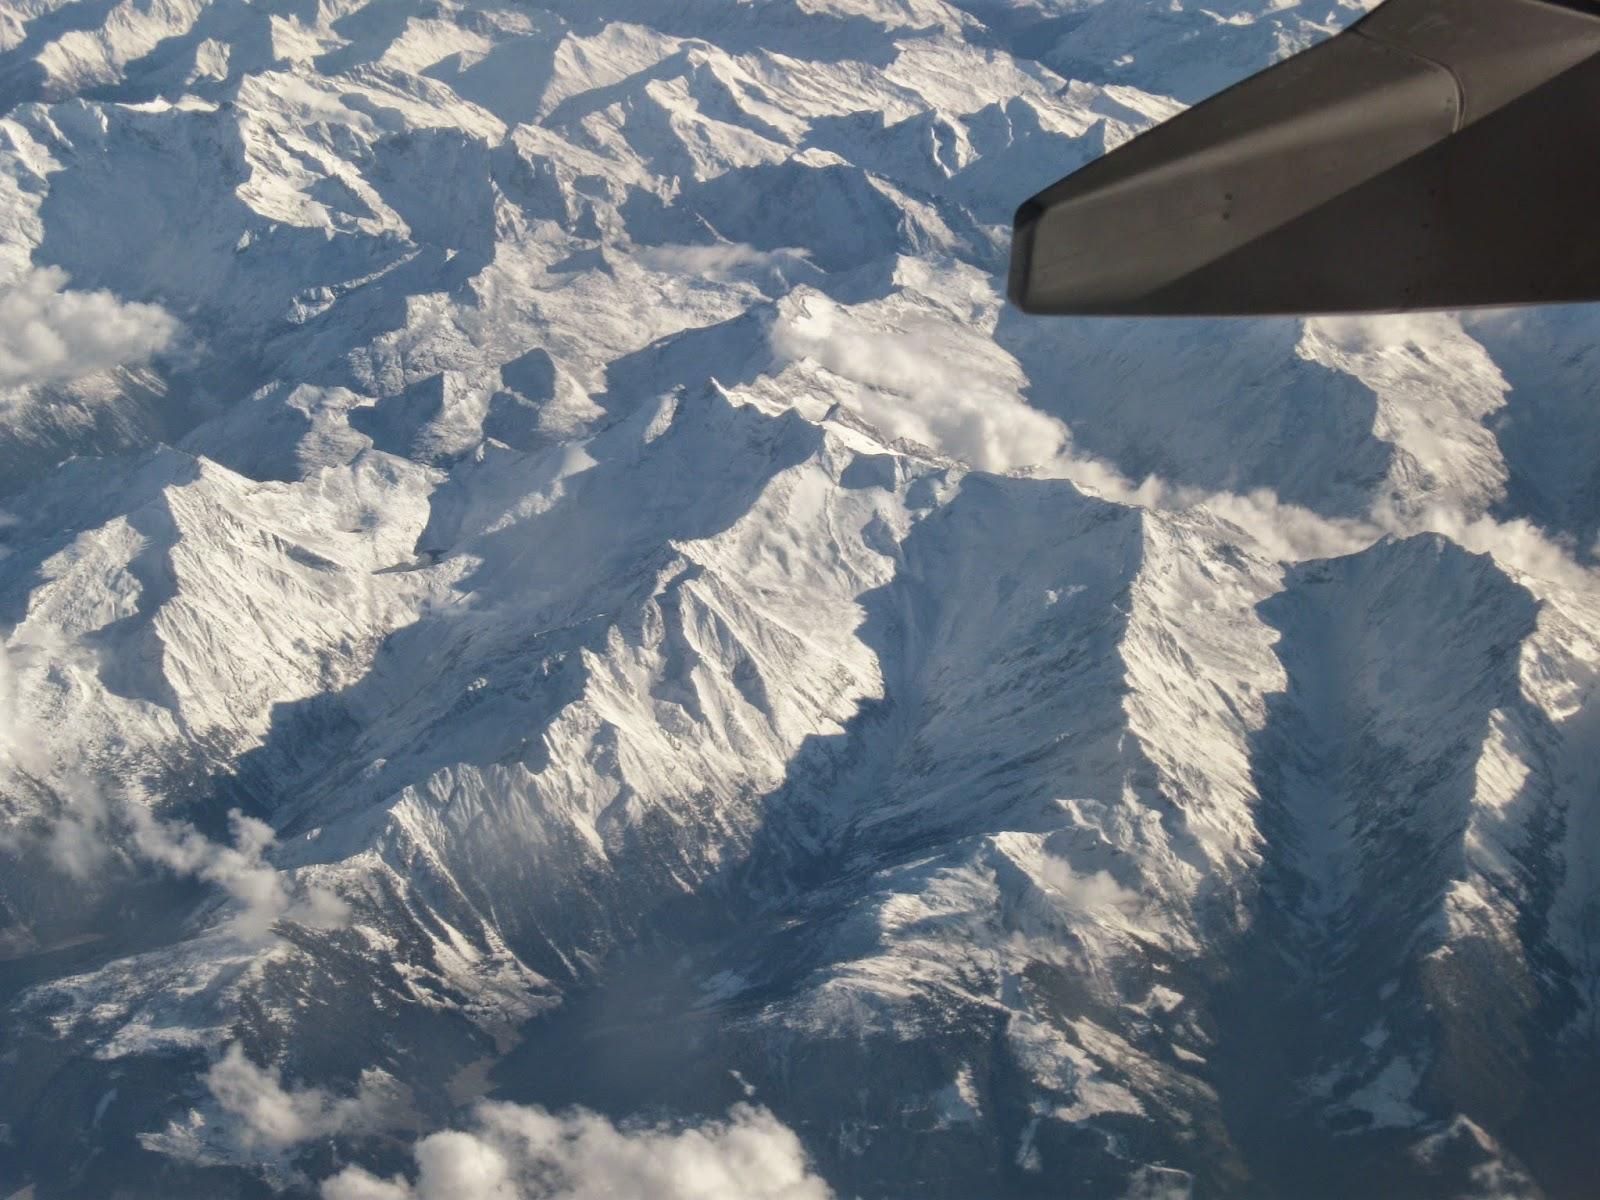 lot samolotem nad Europą widok z góry